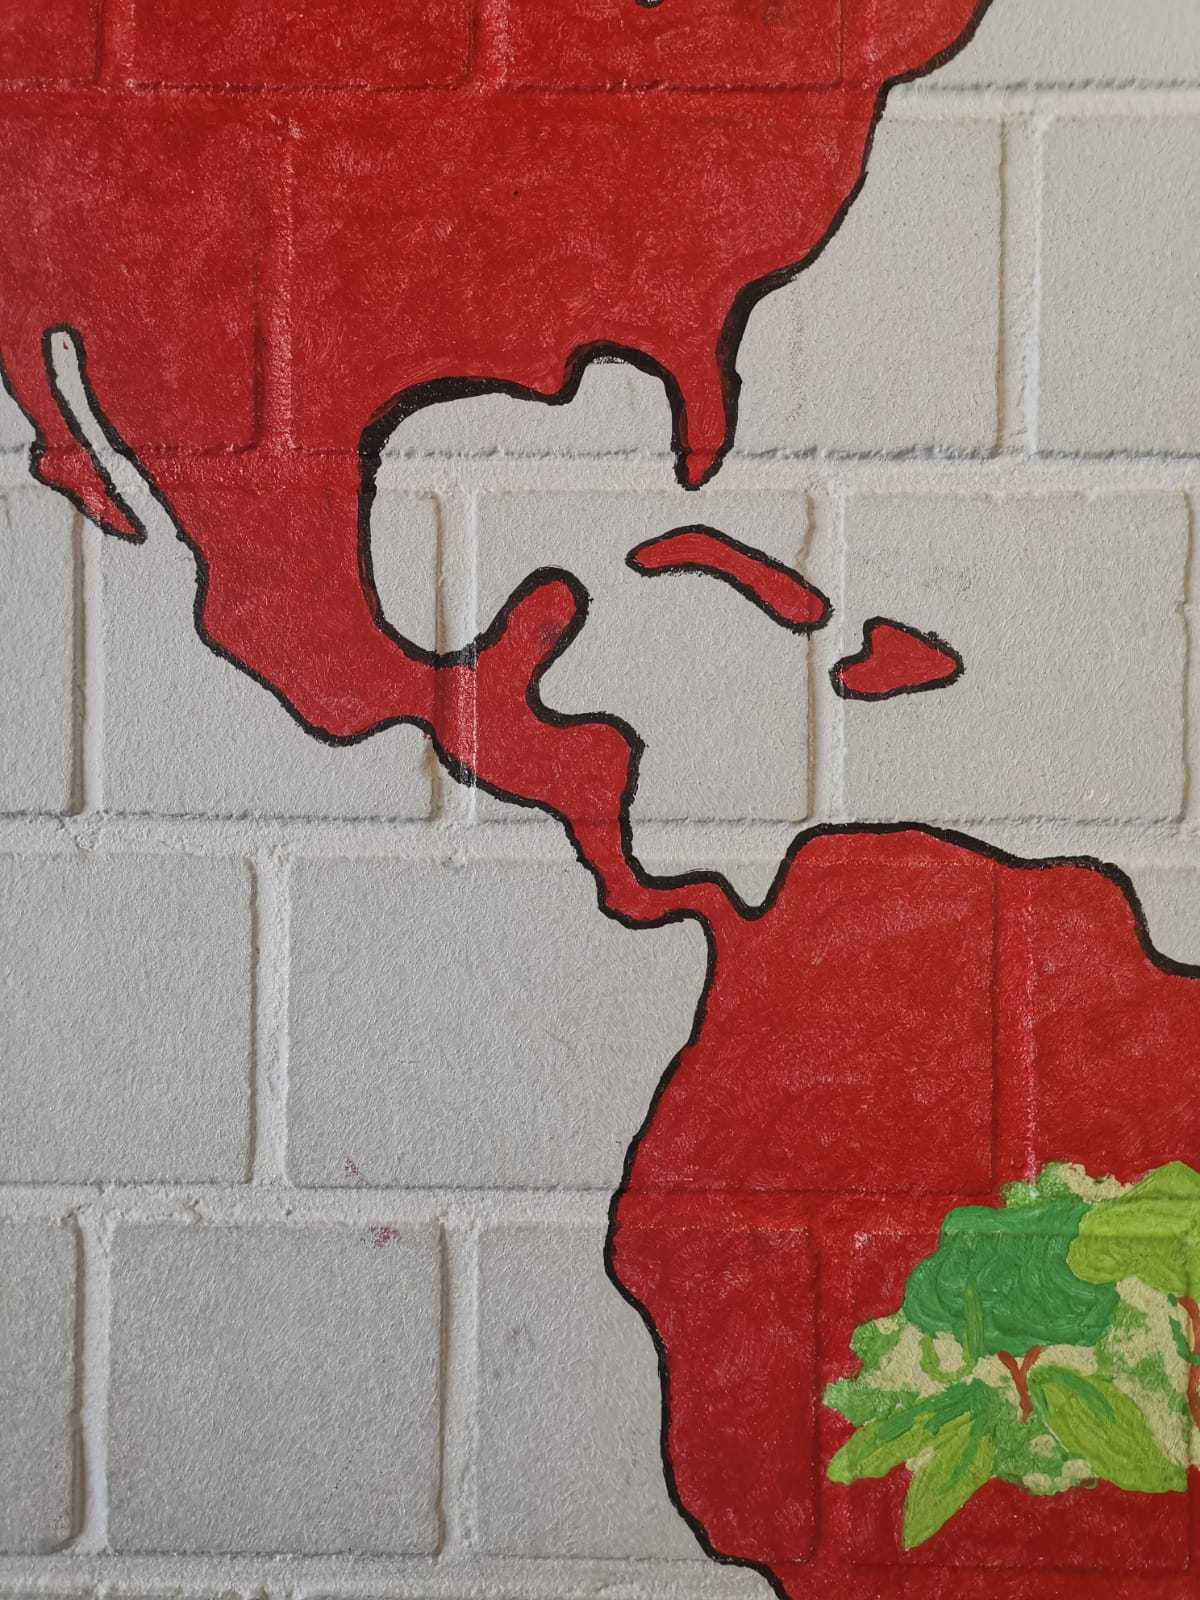 Die Weltkarte im Turnraum